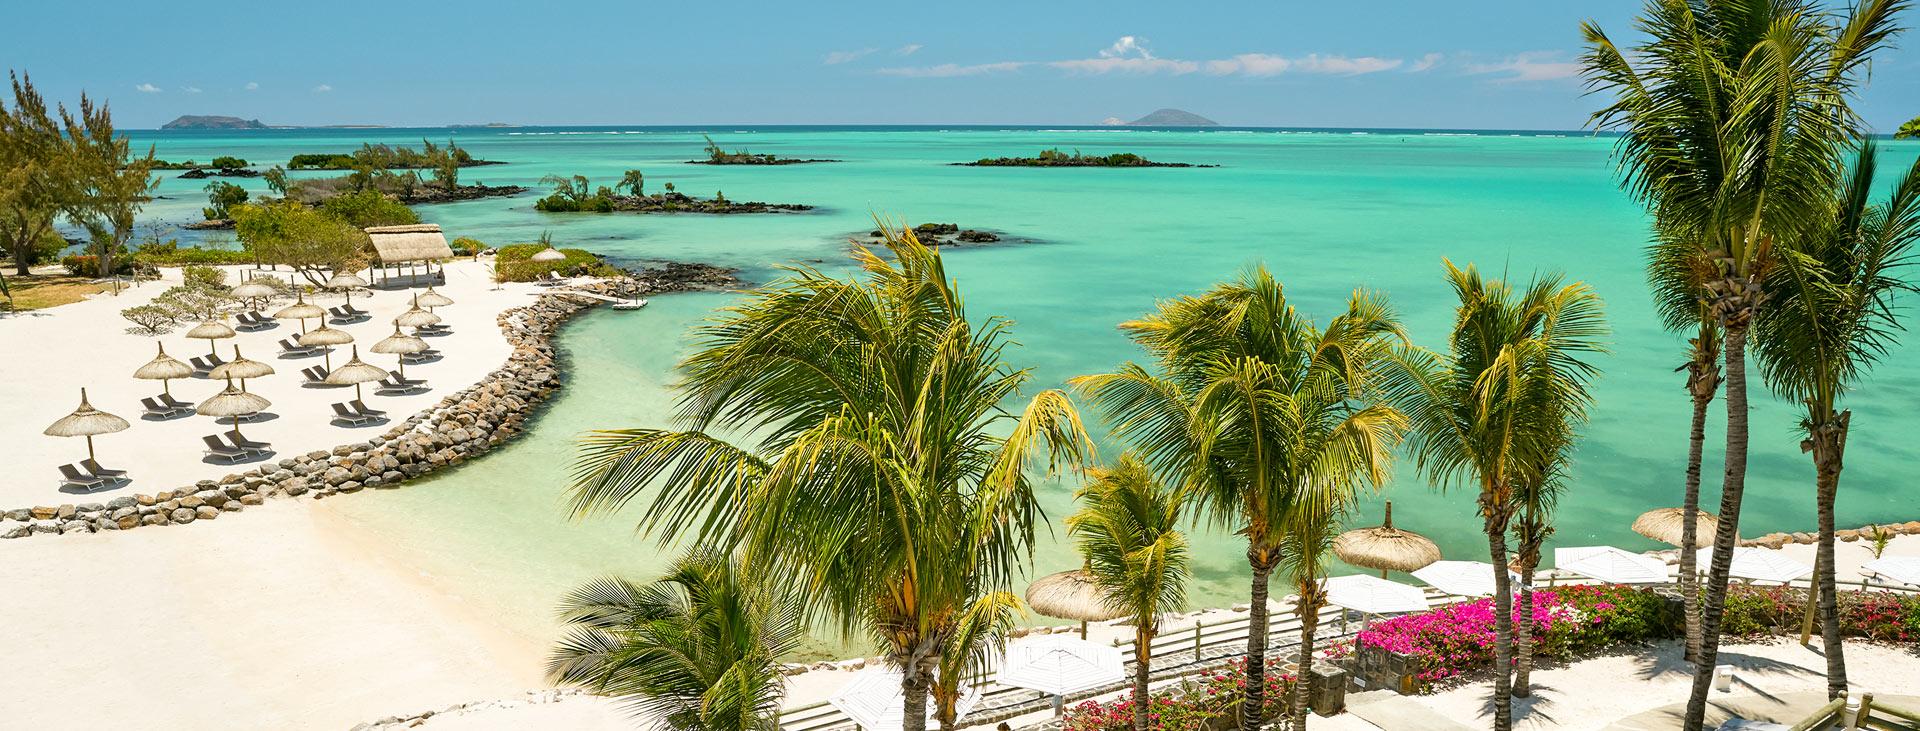 Lagoon Attitude, Mauritius, Mauritius